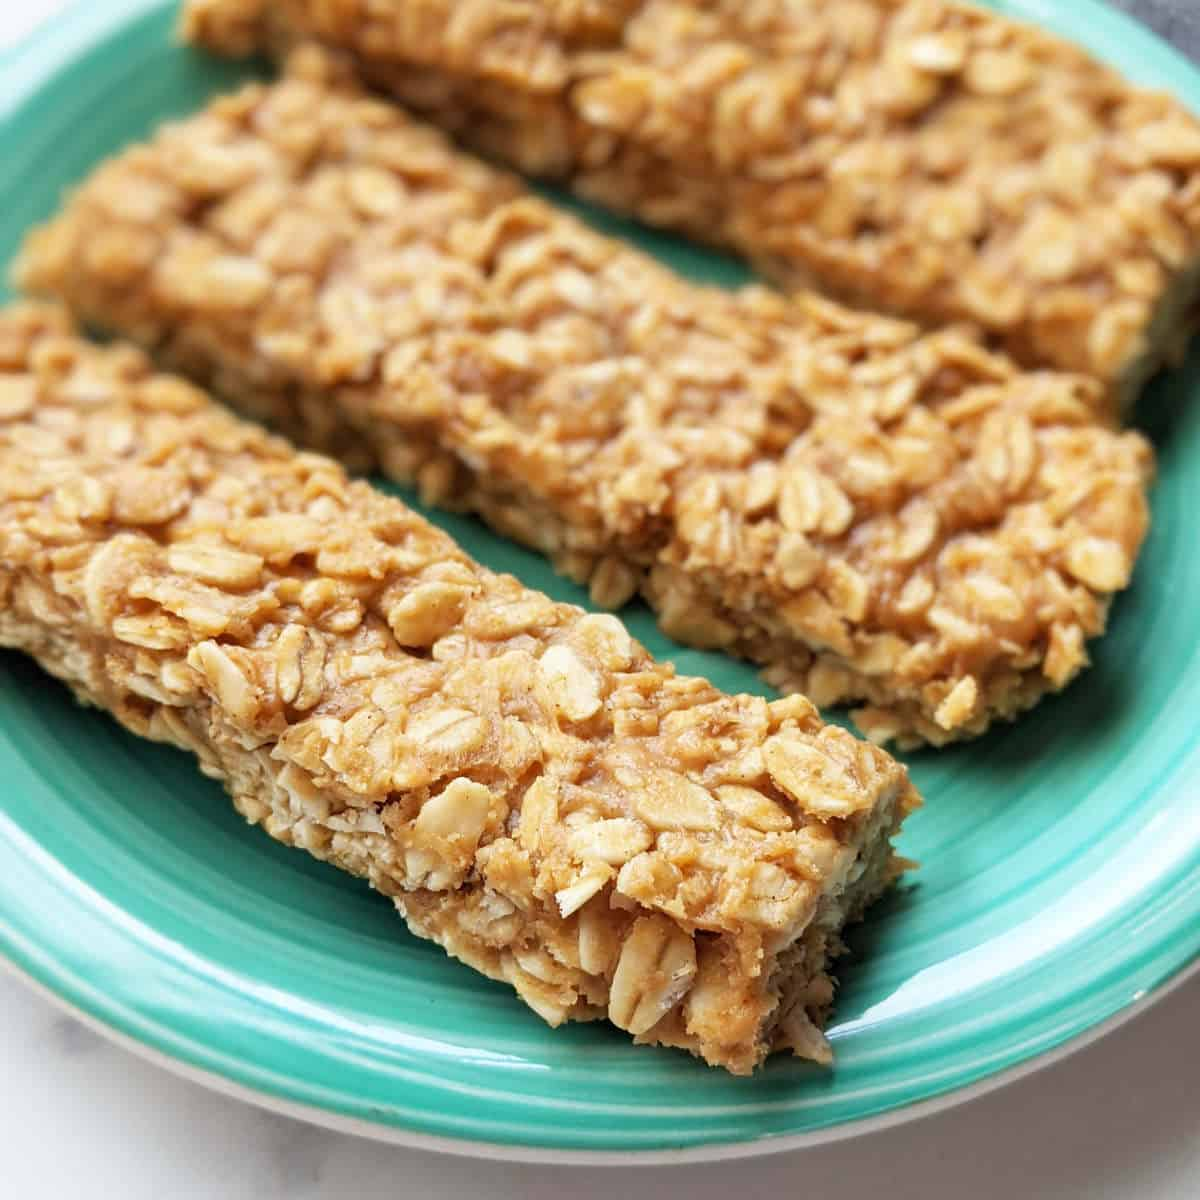 Granola bars on a plate.